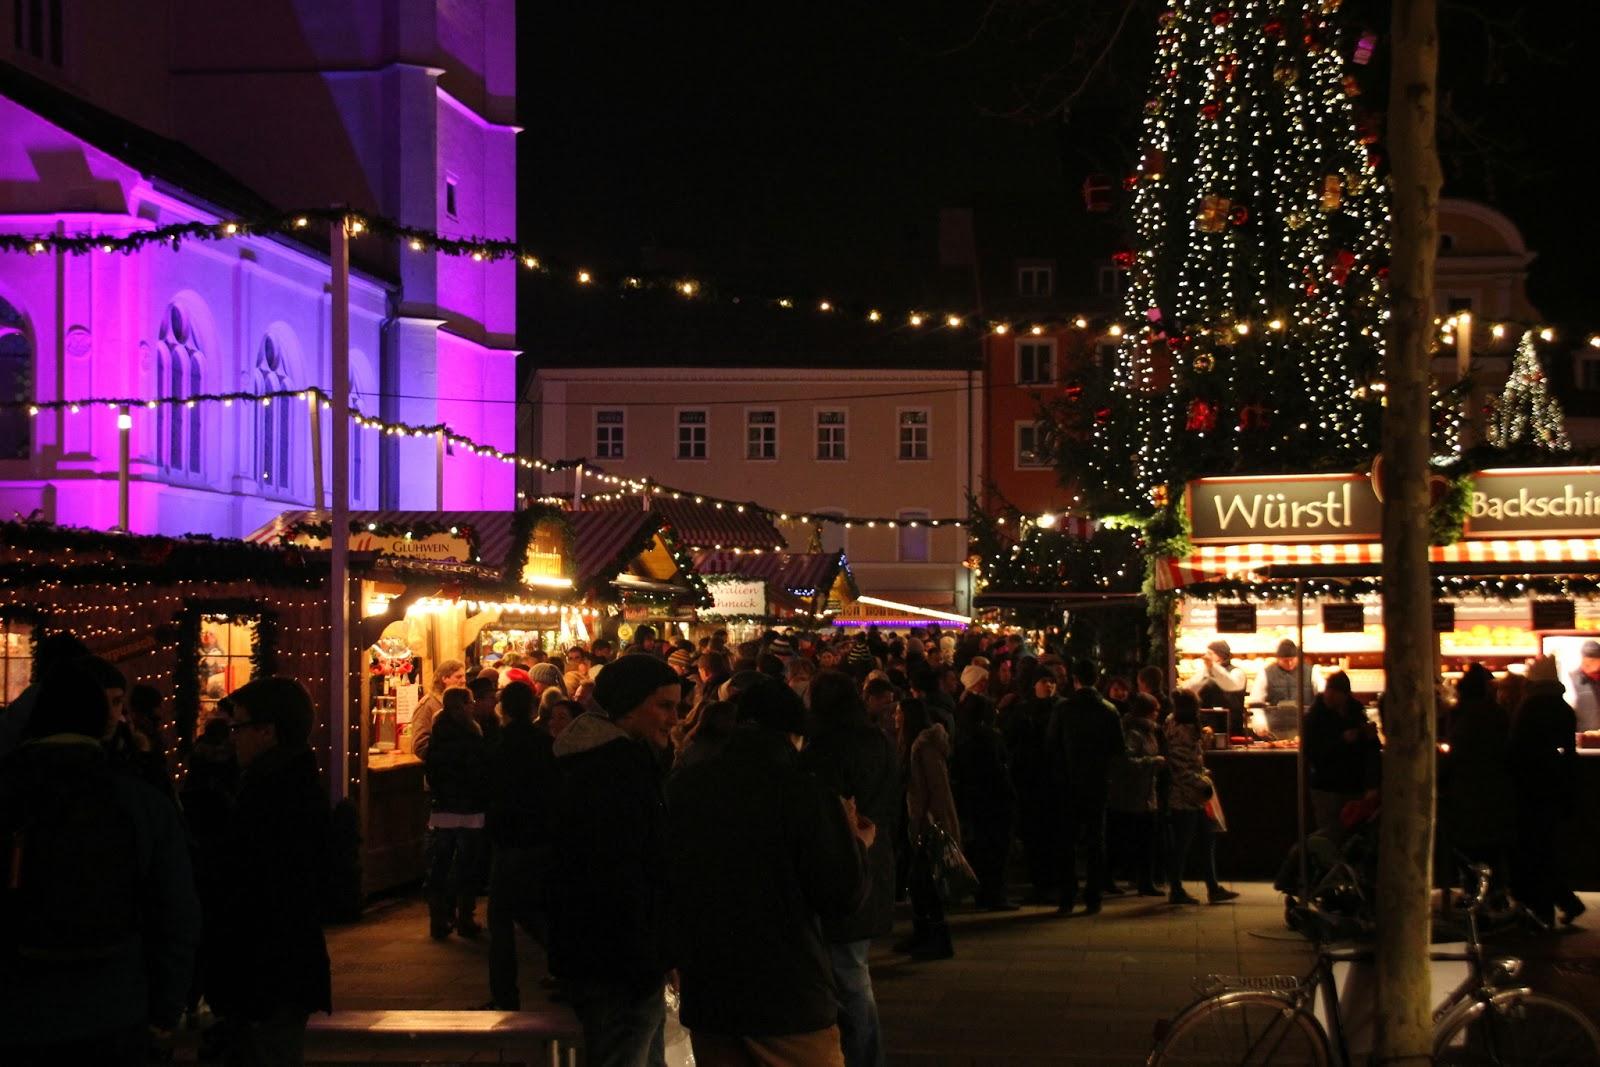 regensburger tagebuch am weihnachtsmarkt neupfarrplatz. Black Bedroom Furniture Sets. Home Design Ideas